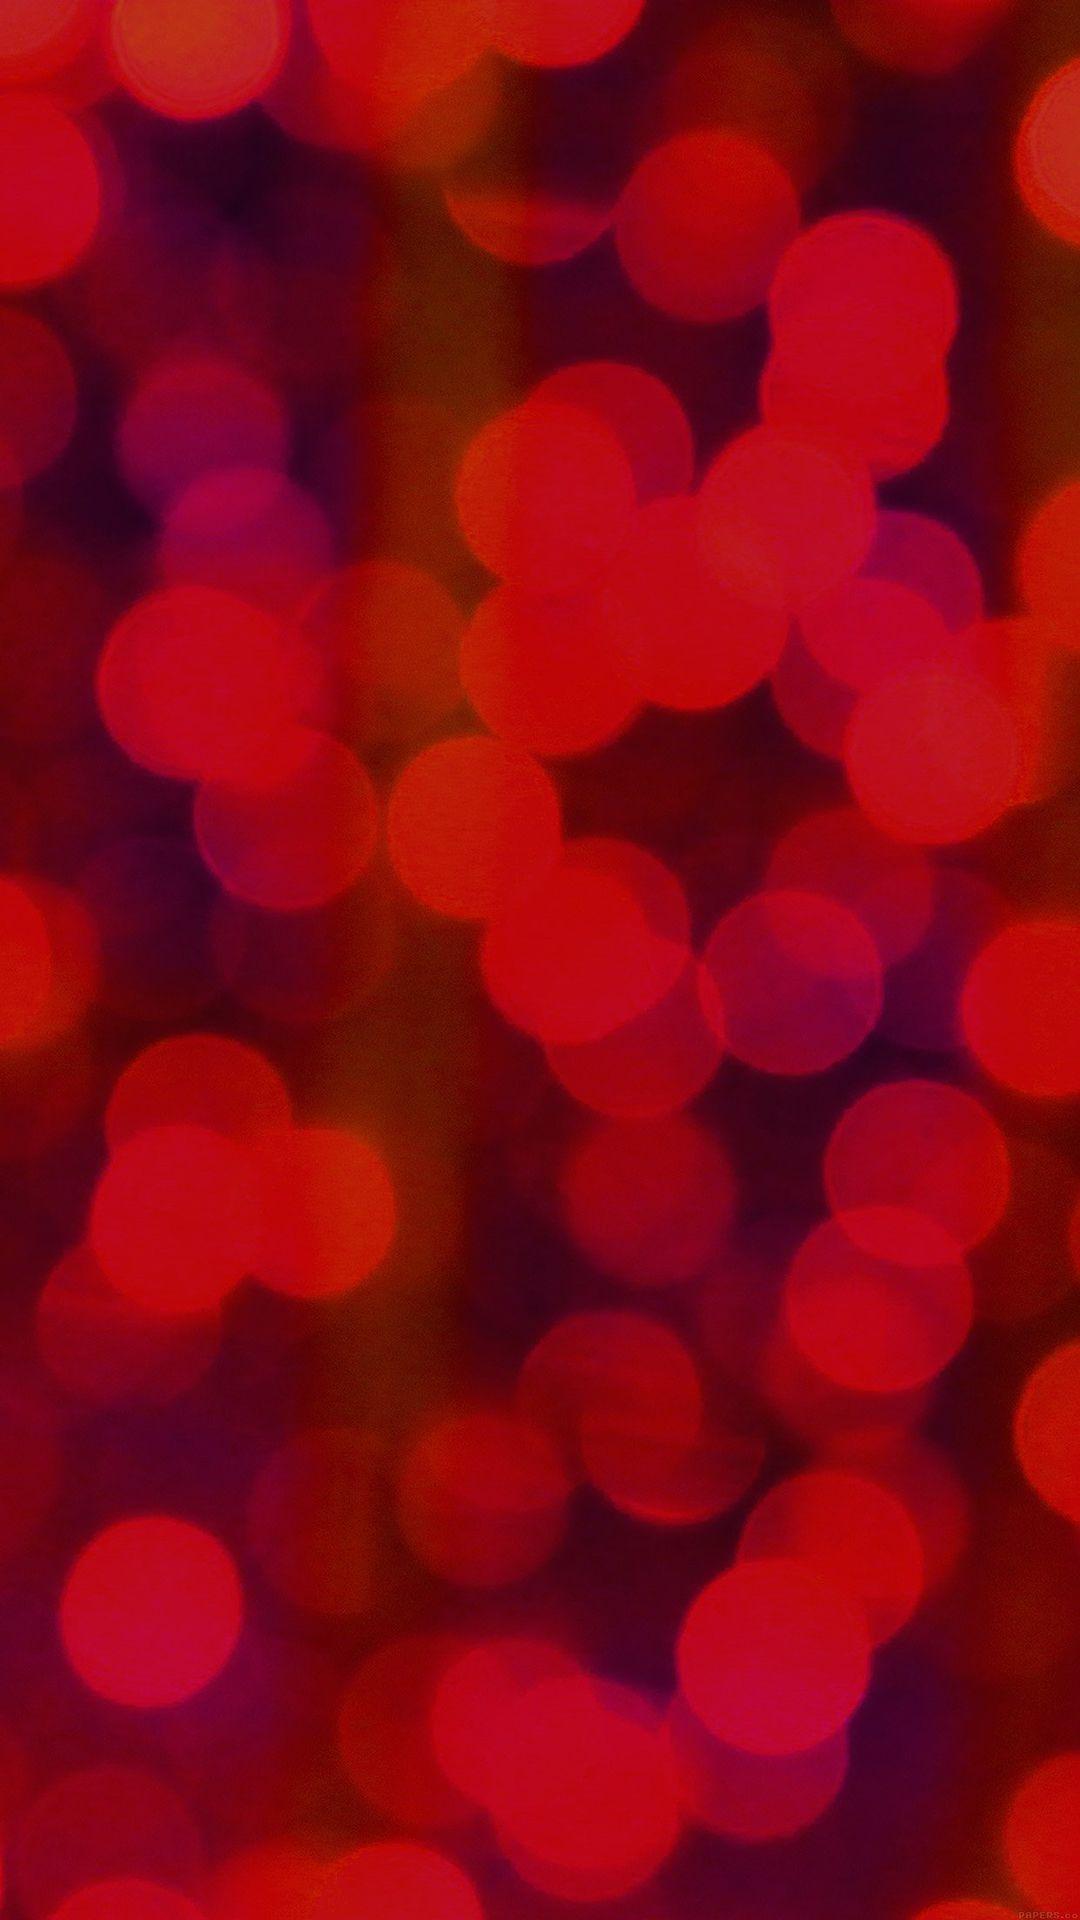 Red Bokeh Circle Abstract Pattern Iphone 6 Wallpaper Download Iphone Wallpapers Ipad Wa Valentines Wallpaper Iphone Valentines Wallpaper Iphone 5s Wallpaper